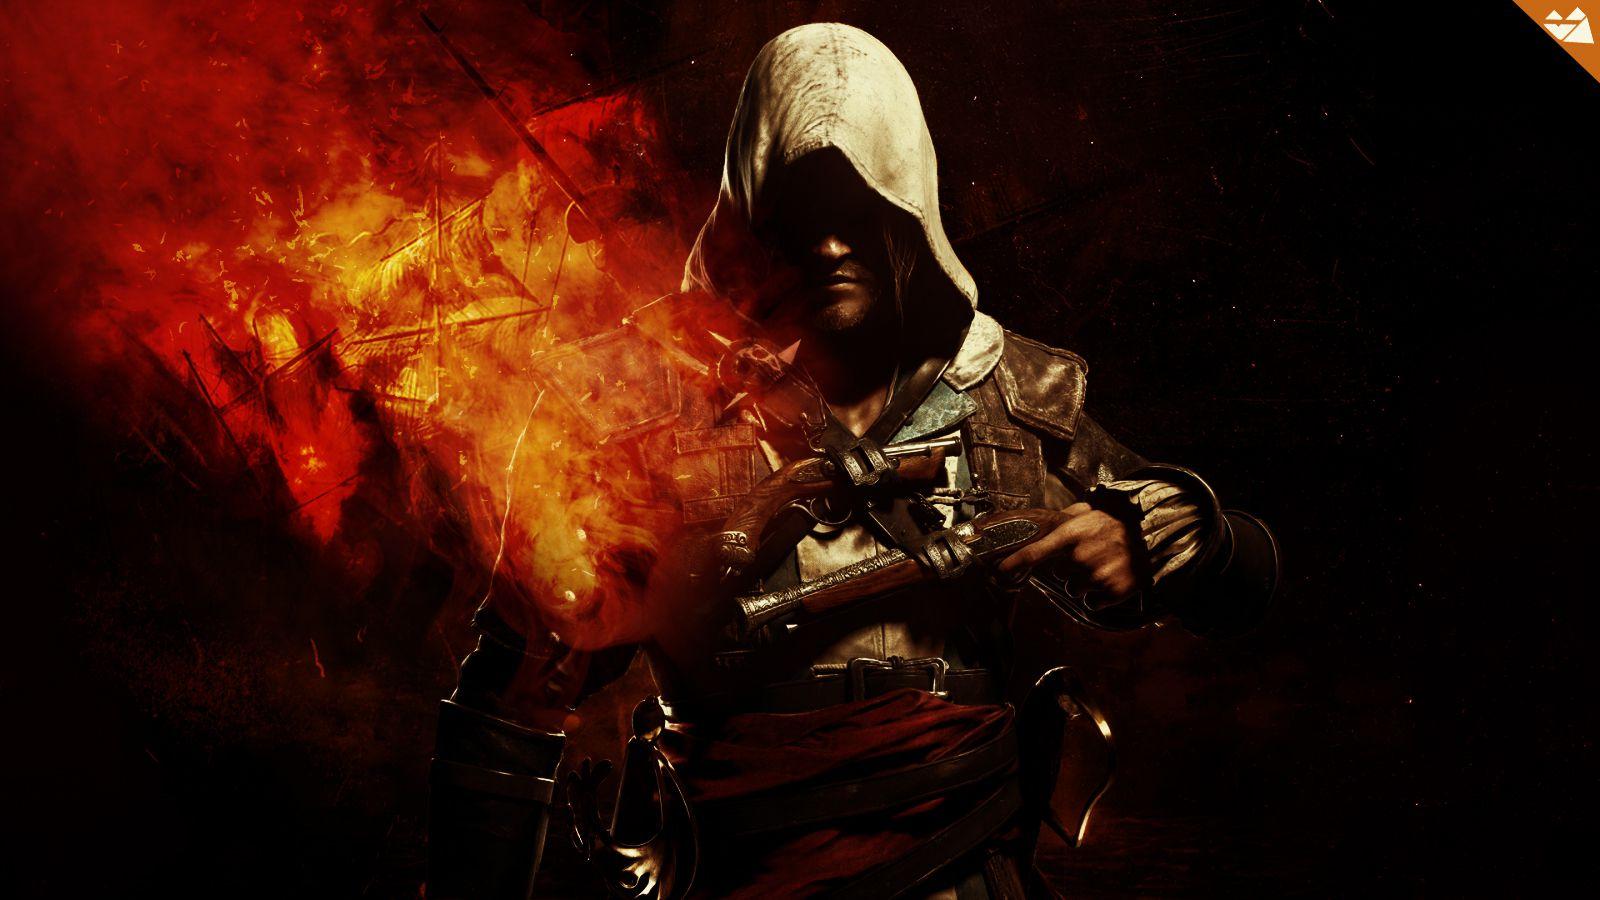 Assassins creed 4 black flag картинки